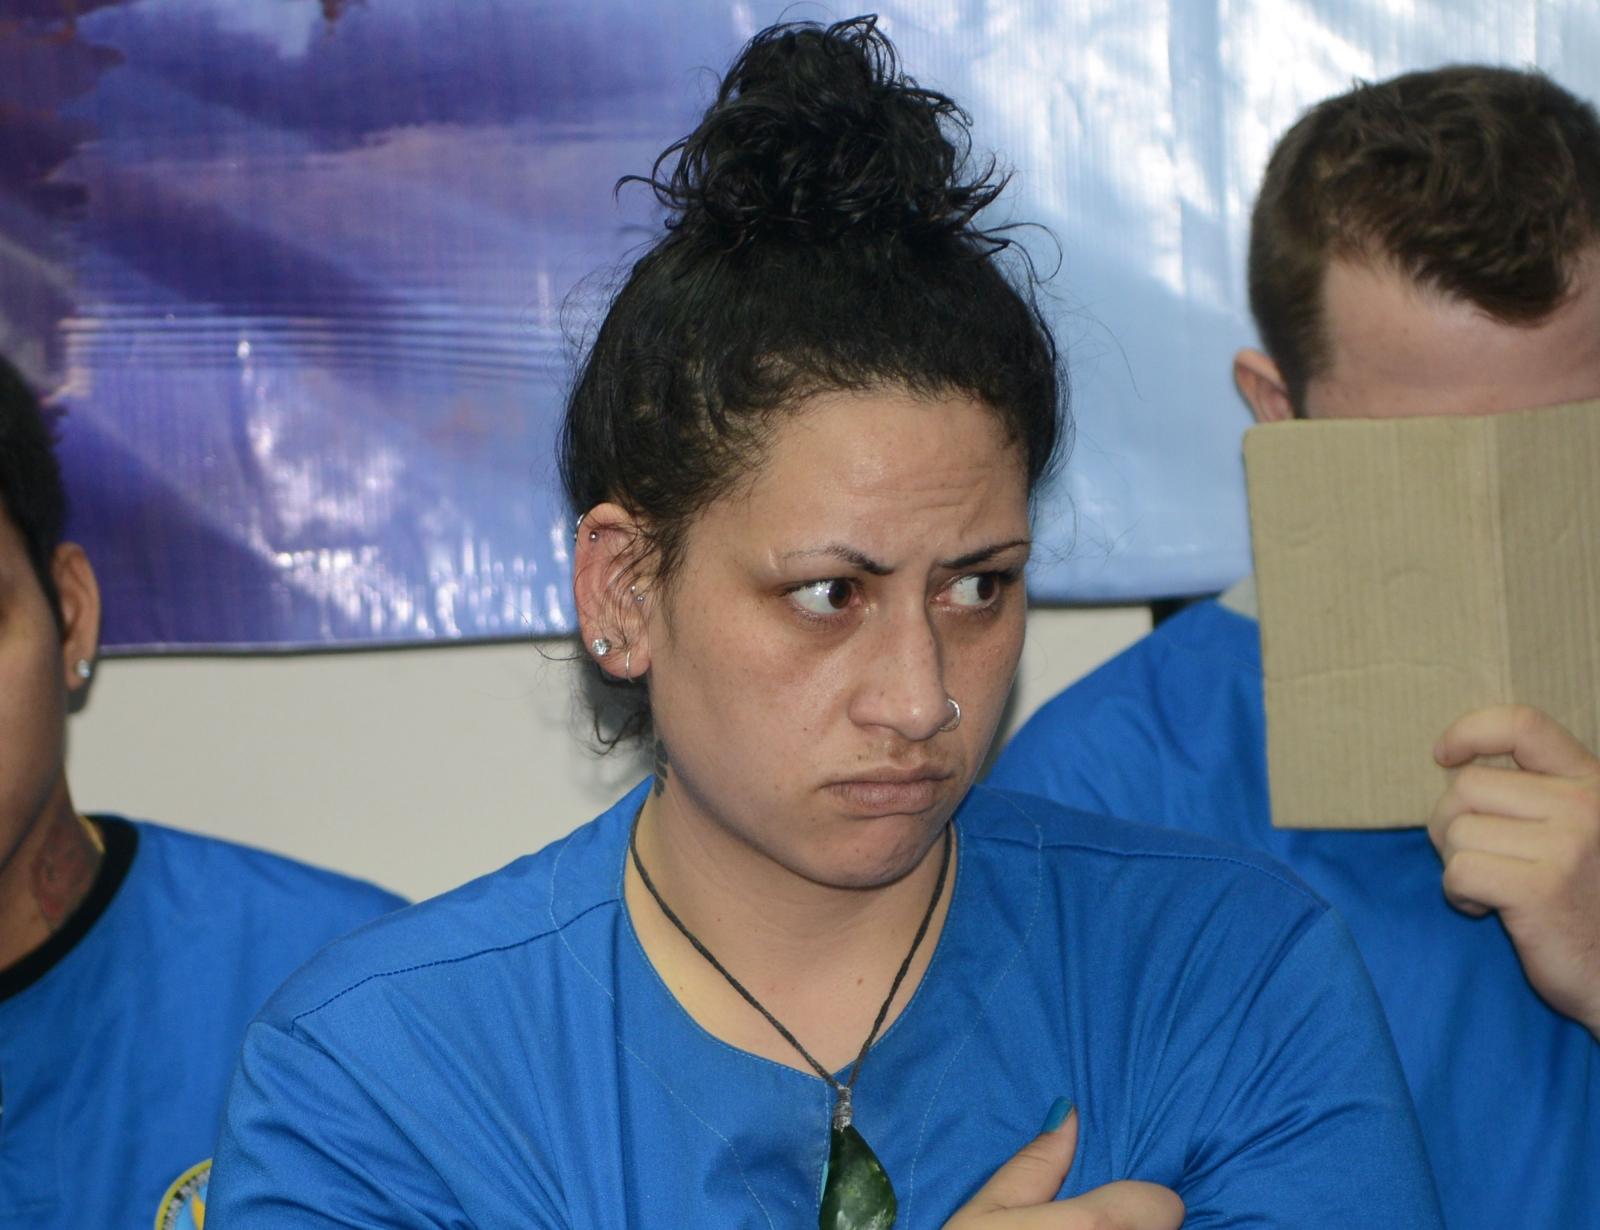 New Zealand woman arrested in Bali drugs case